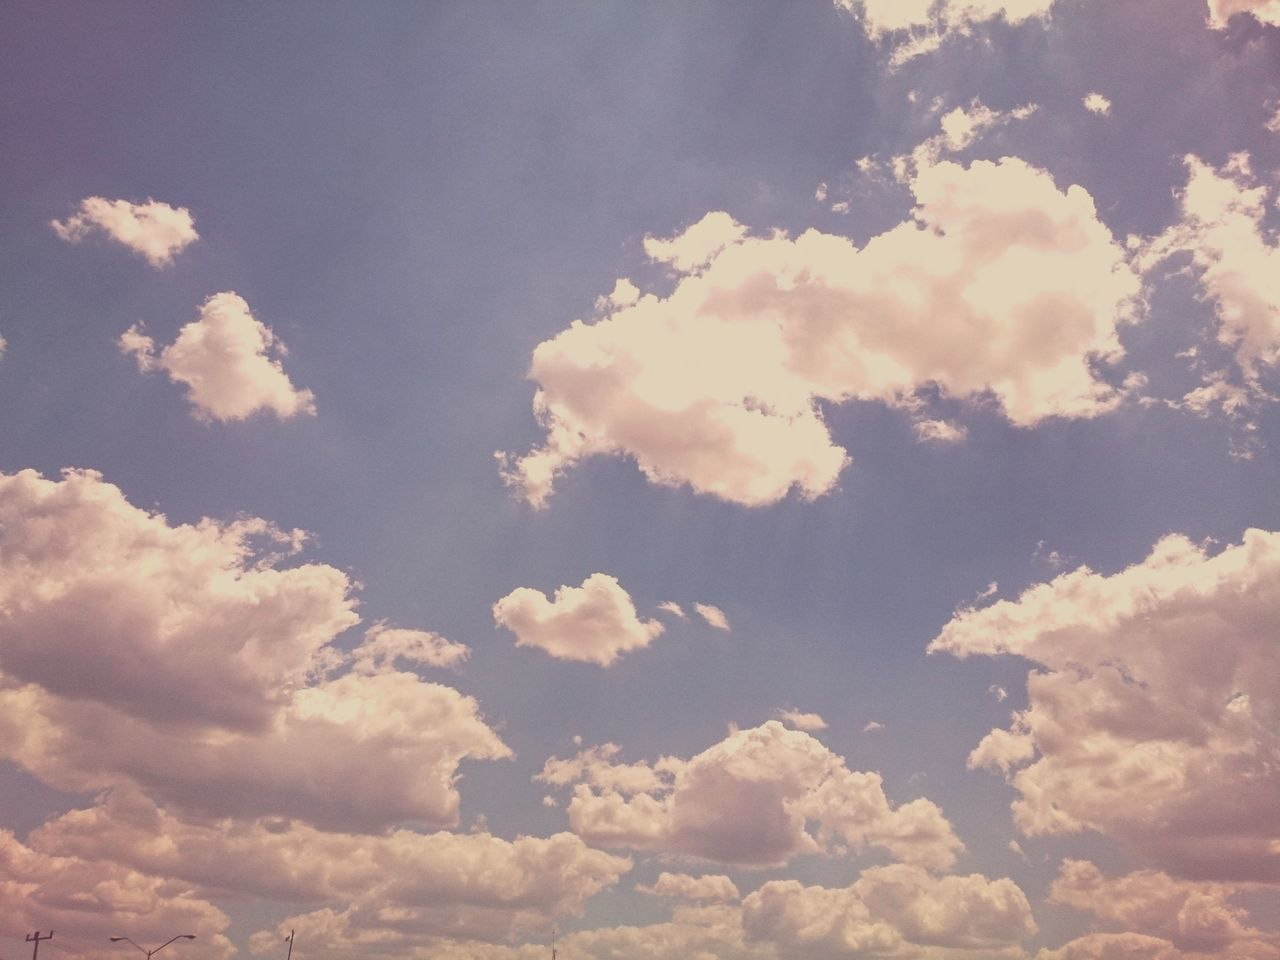 Cloudy sky. Outdoors No People Xperia ZL Mobile Photography Mérida Yucatán Landscape Blue Sky Yucatan Mexico Cloudy Sky Clouds & Sky